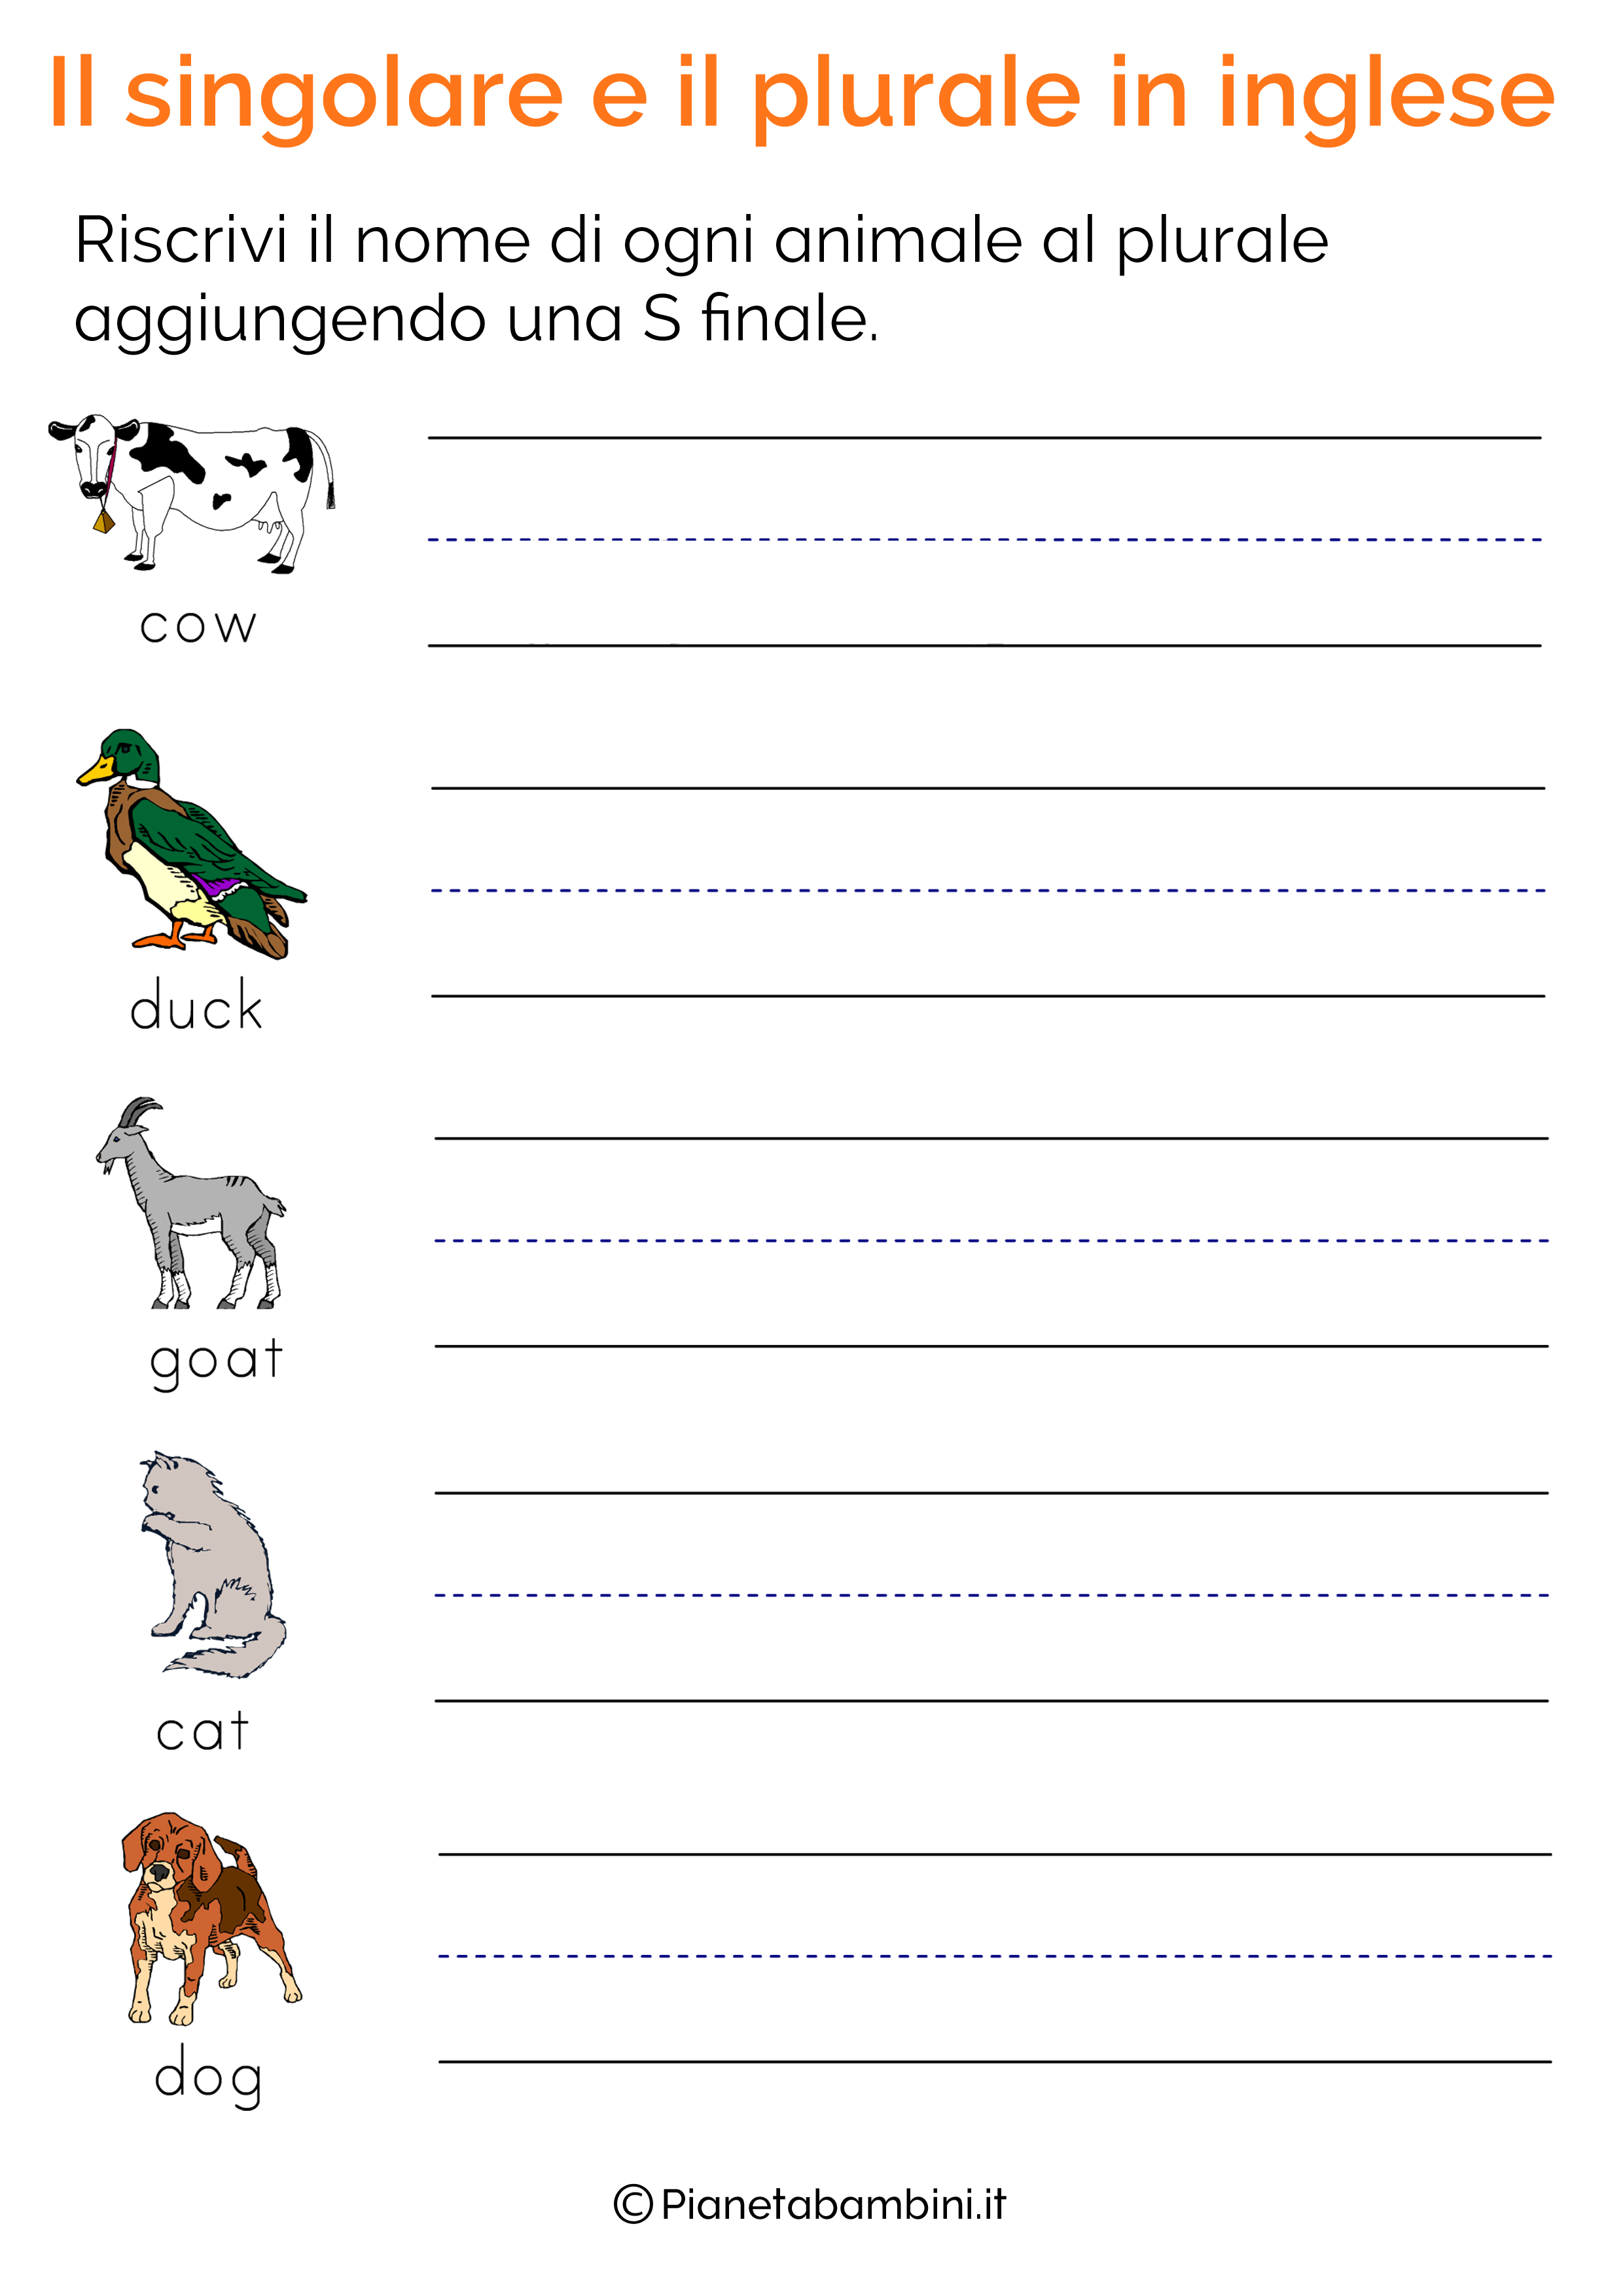 Esercizi-Singolare-Plurale-Inglese-04